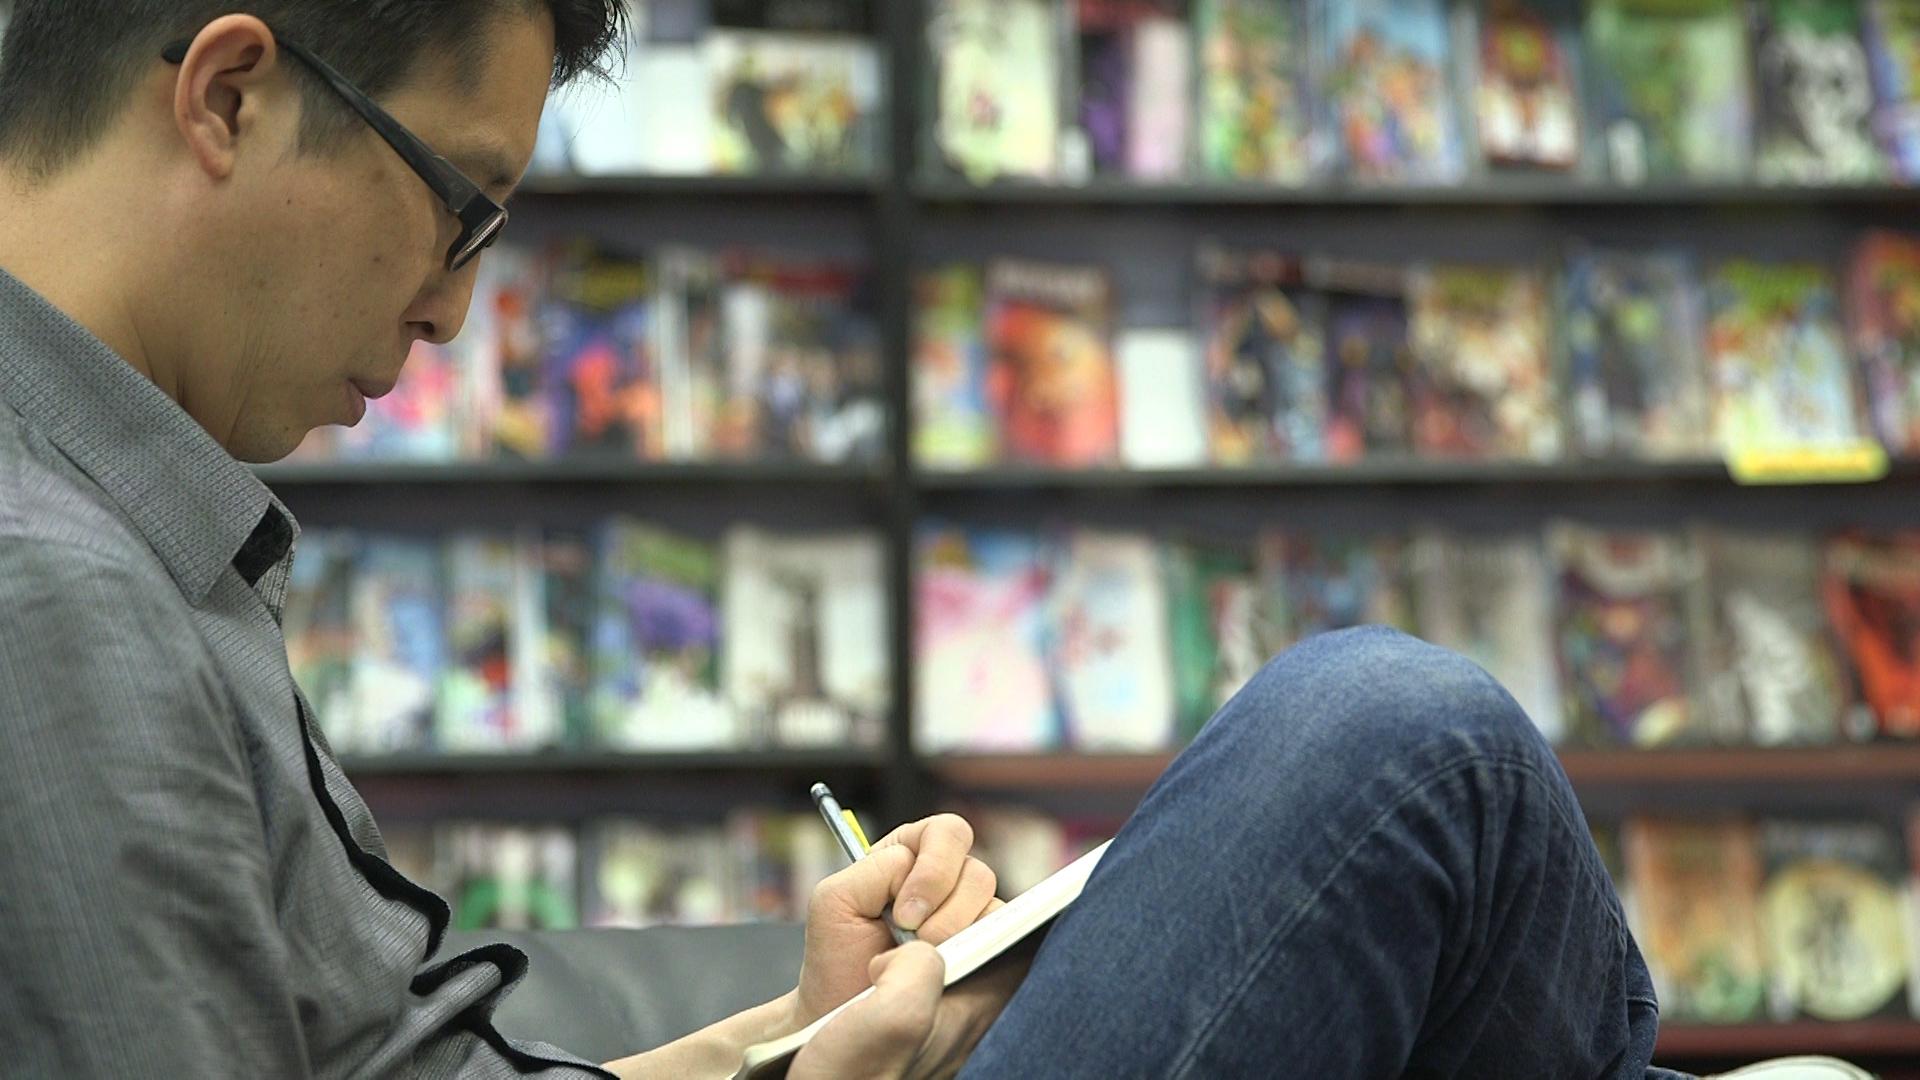 Gene Yang Doing art in comic book store different angle.jpg